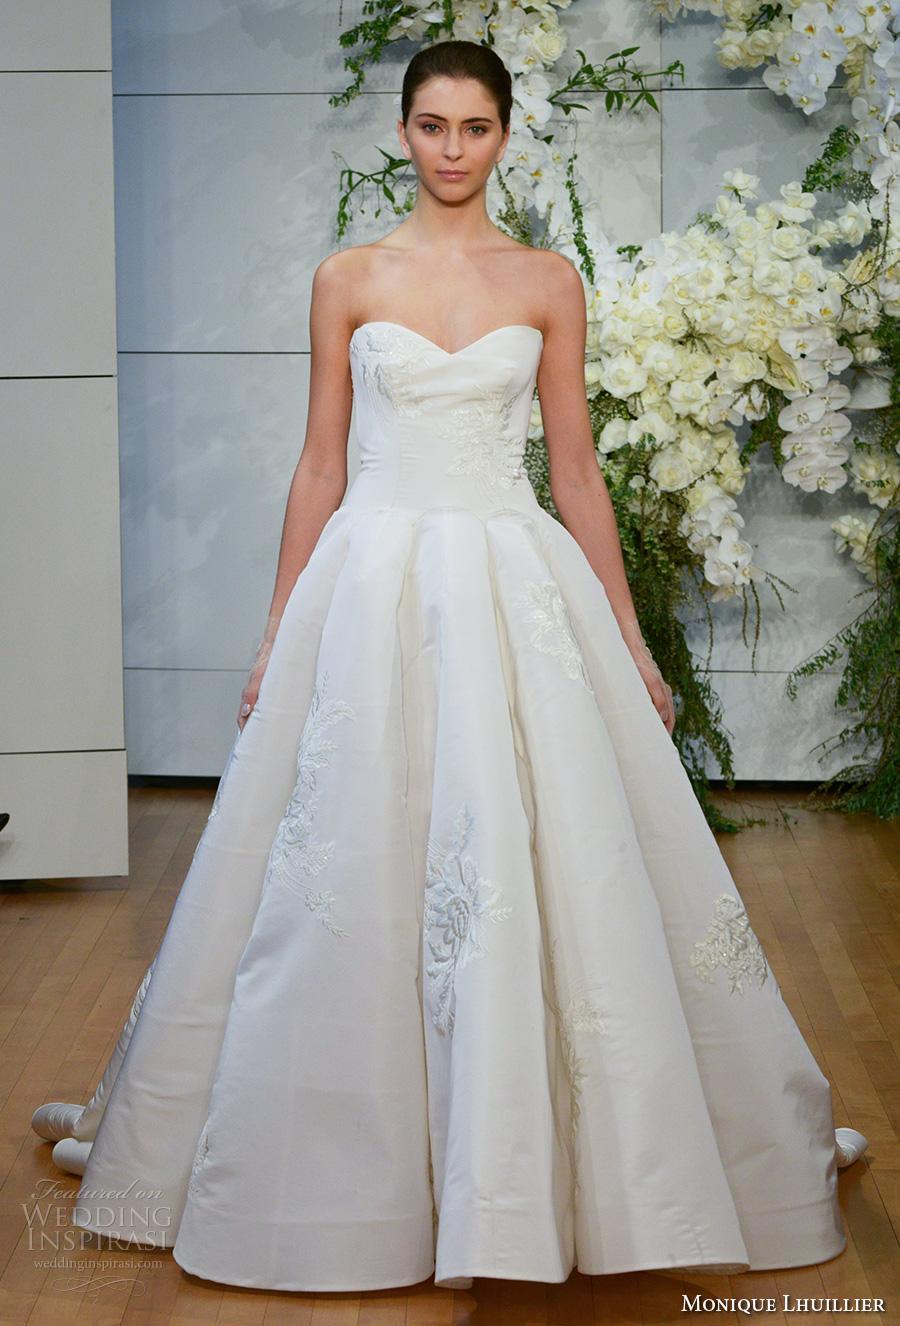 monique lhuillier spring 2018 bridal strapless sweetheart neckline light embellishment ball gown wedding dress chapel train (juliette) mv